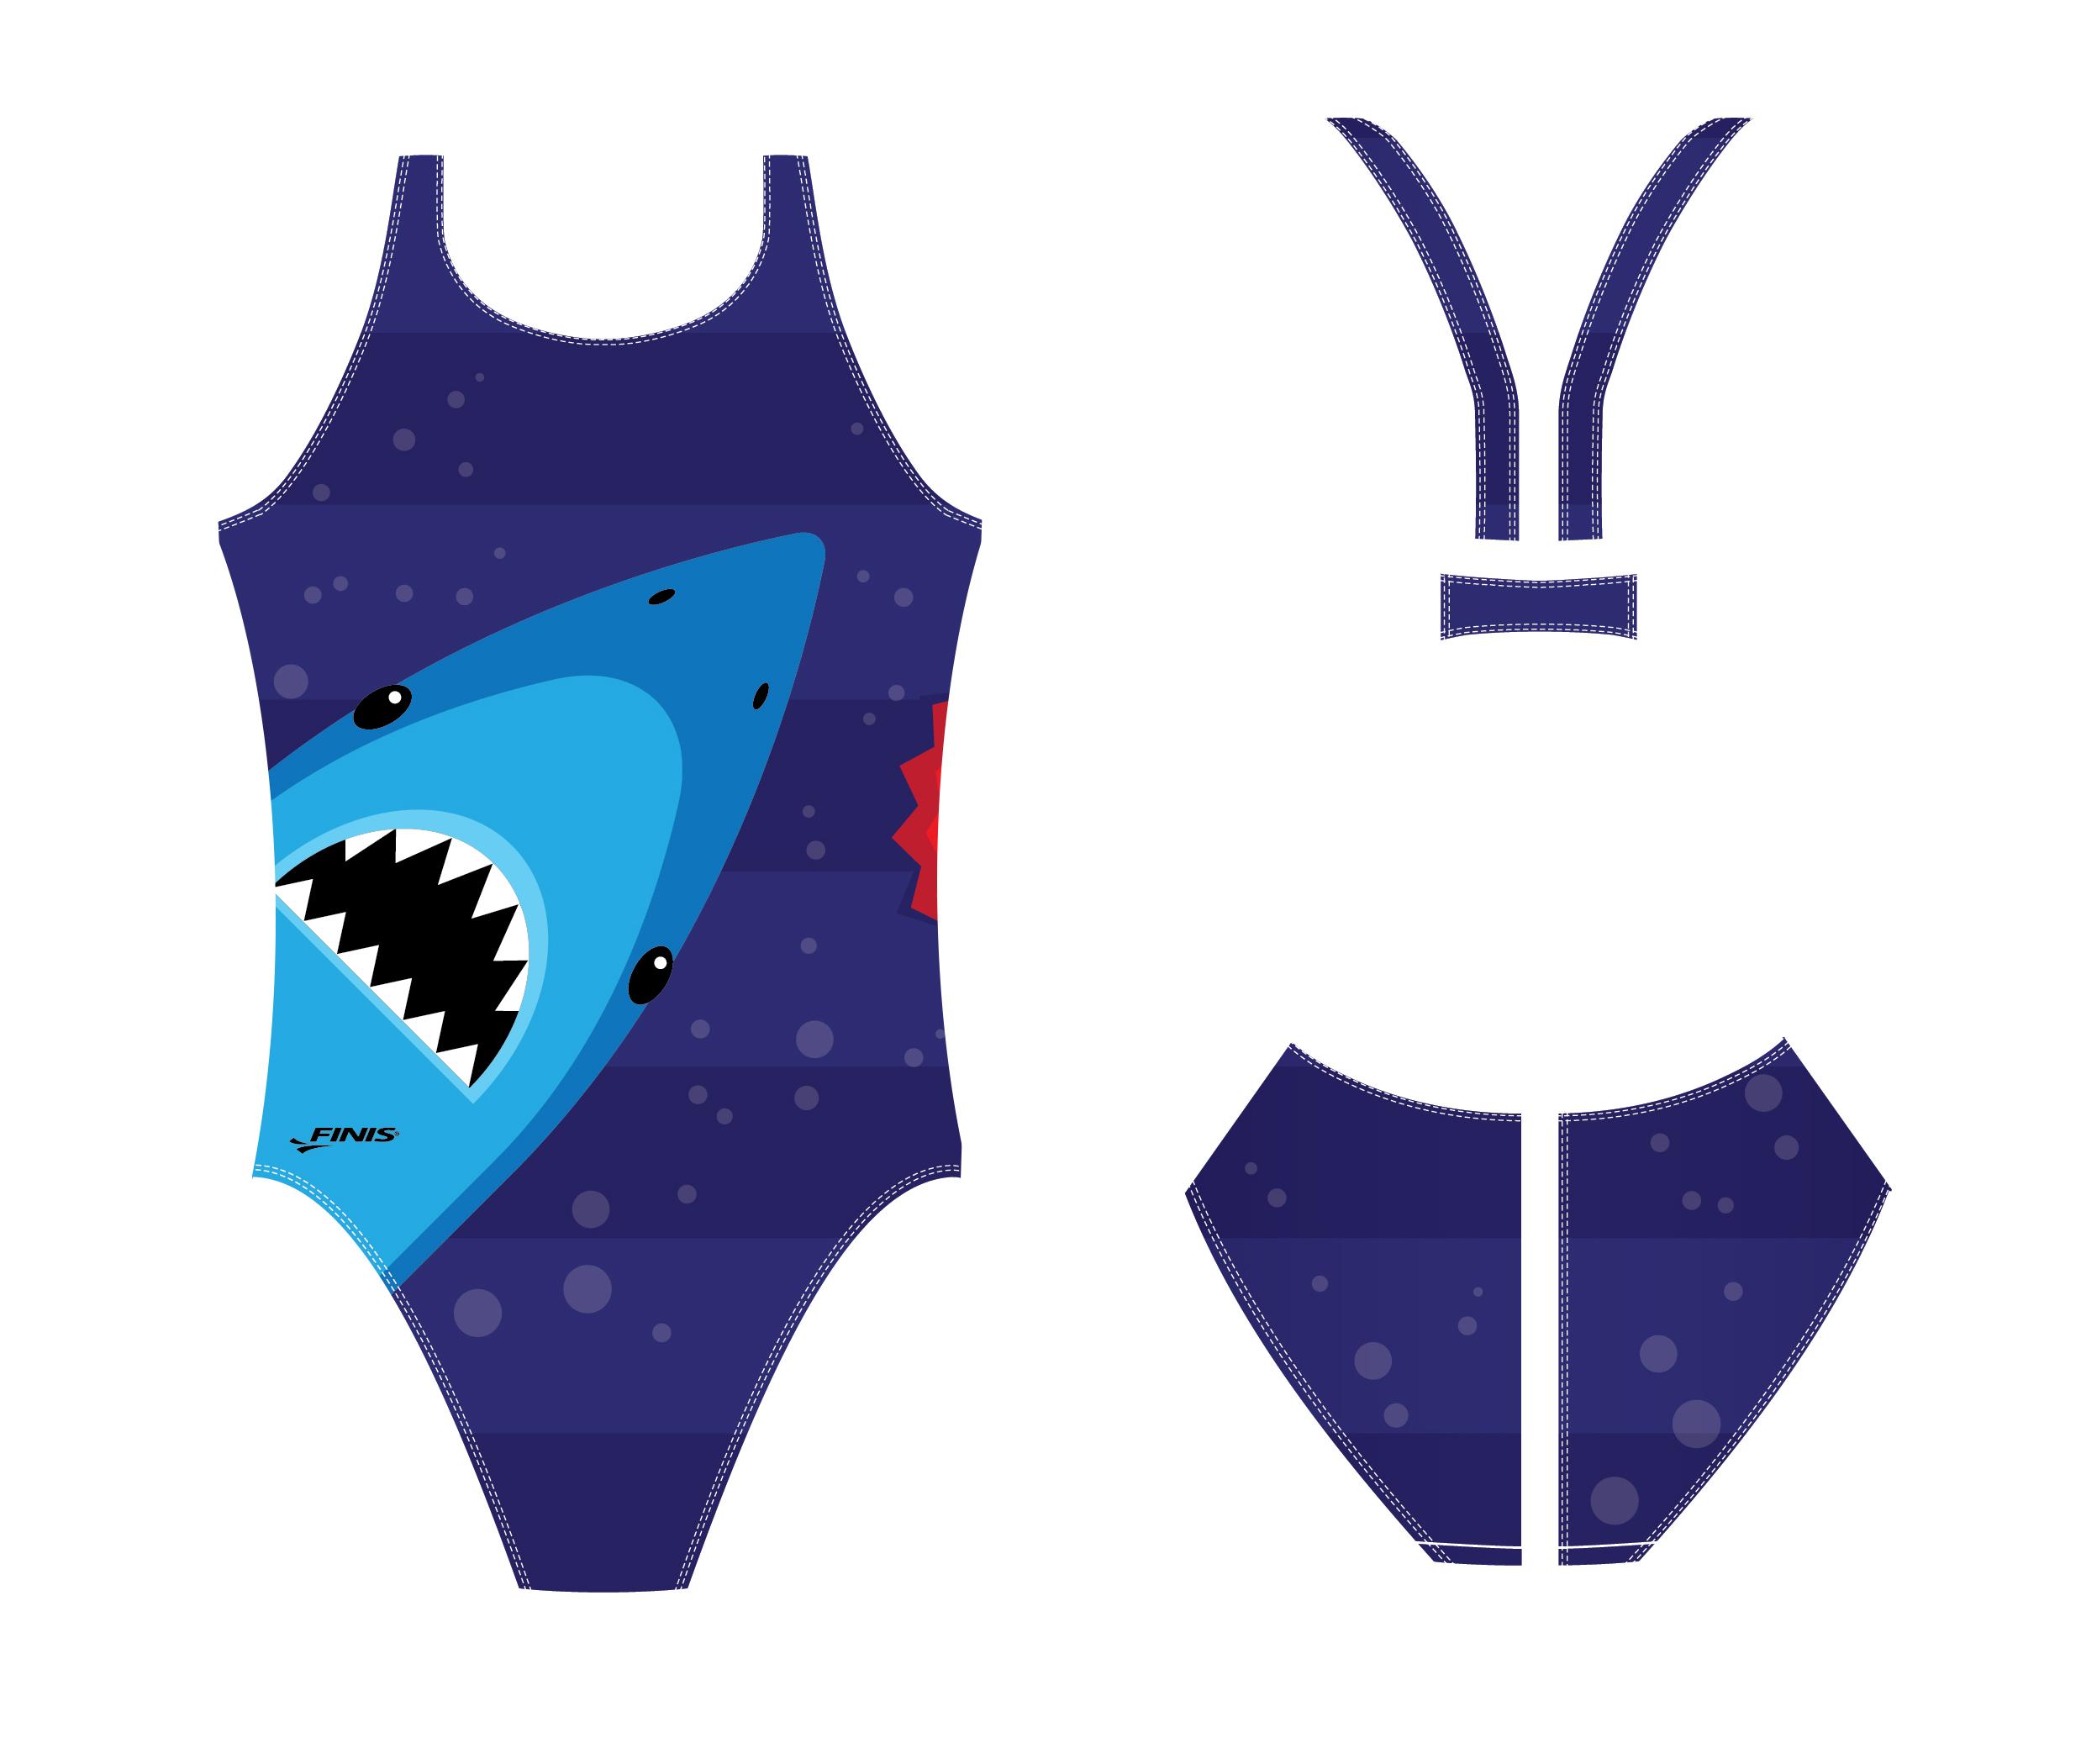 25x50swim-Bladeback-Design-SharkAttack-Mask.jpg